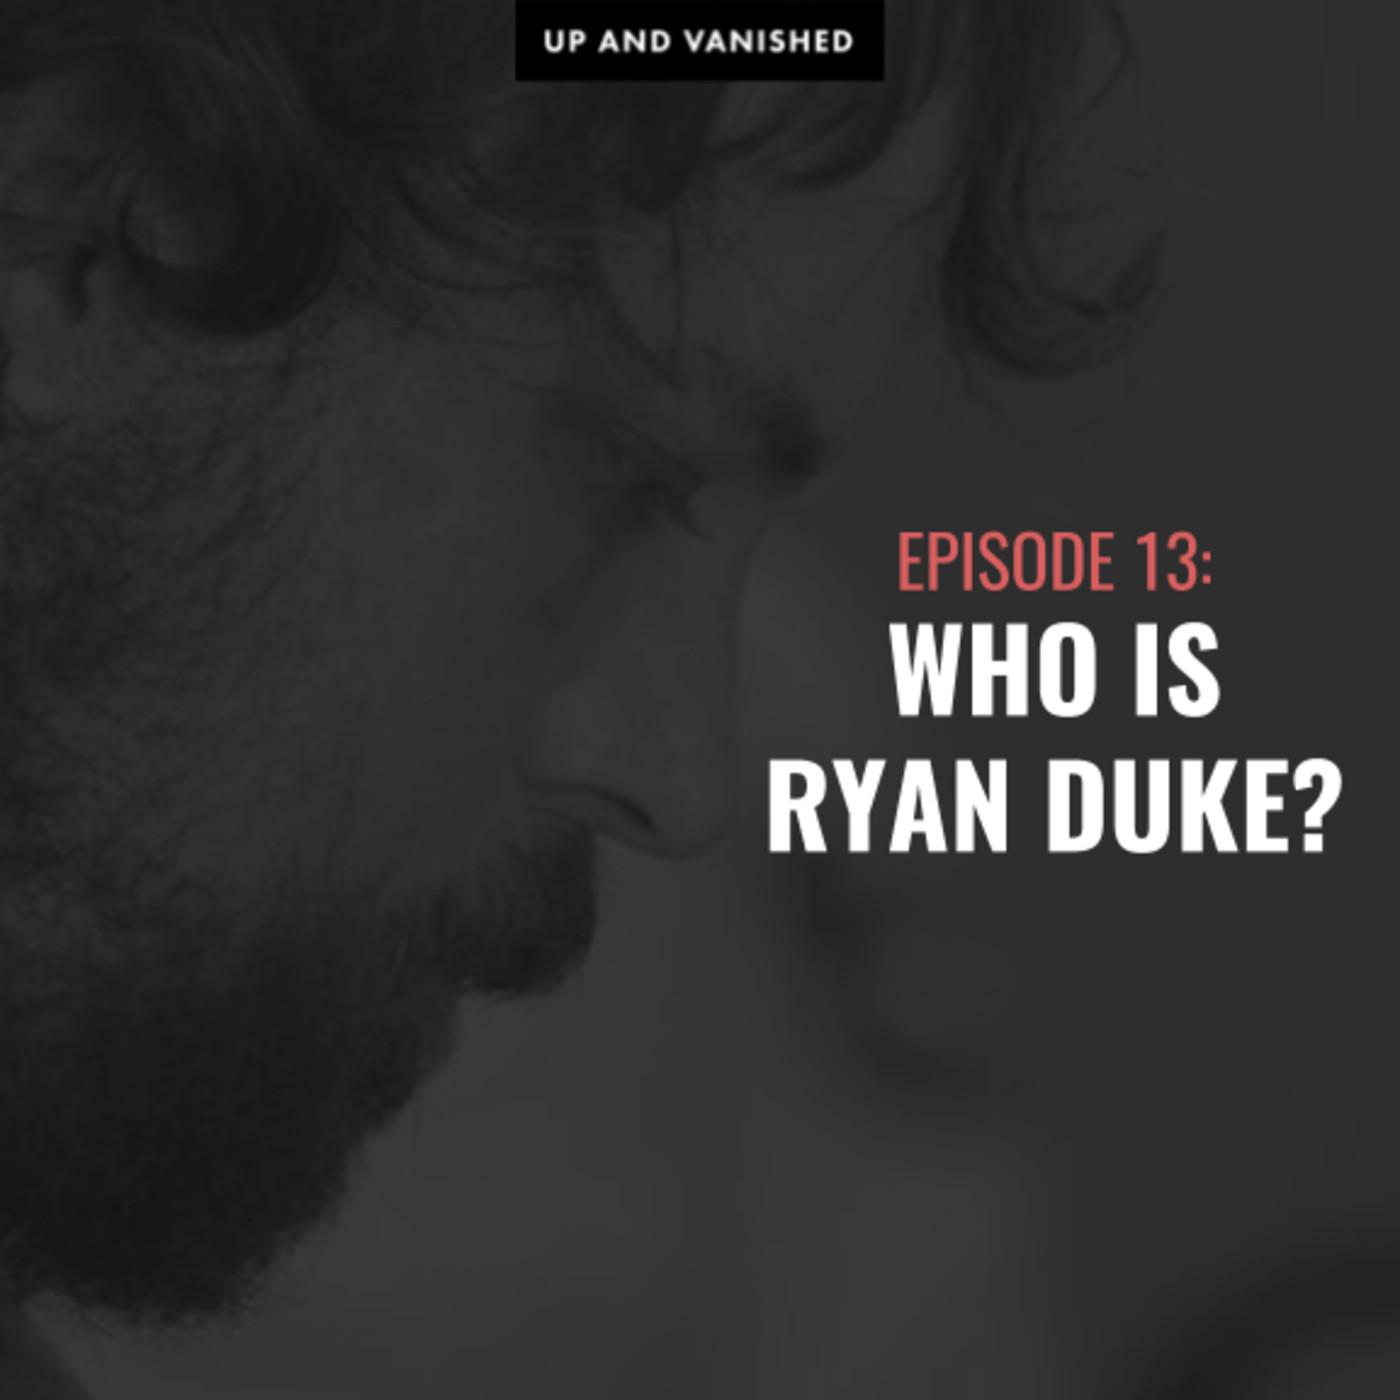 S1E13: Who is Ryan Duke?